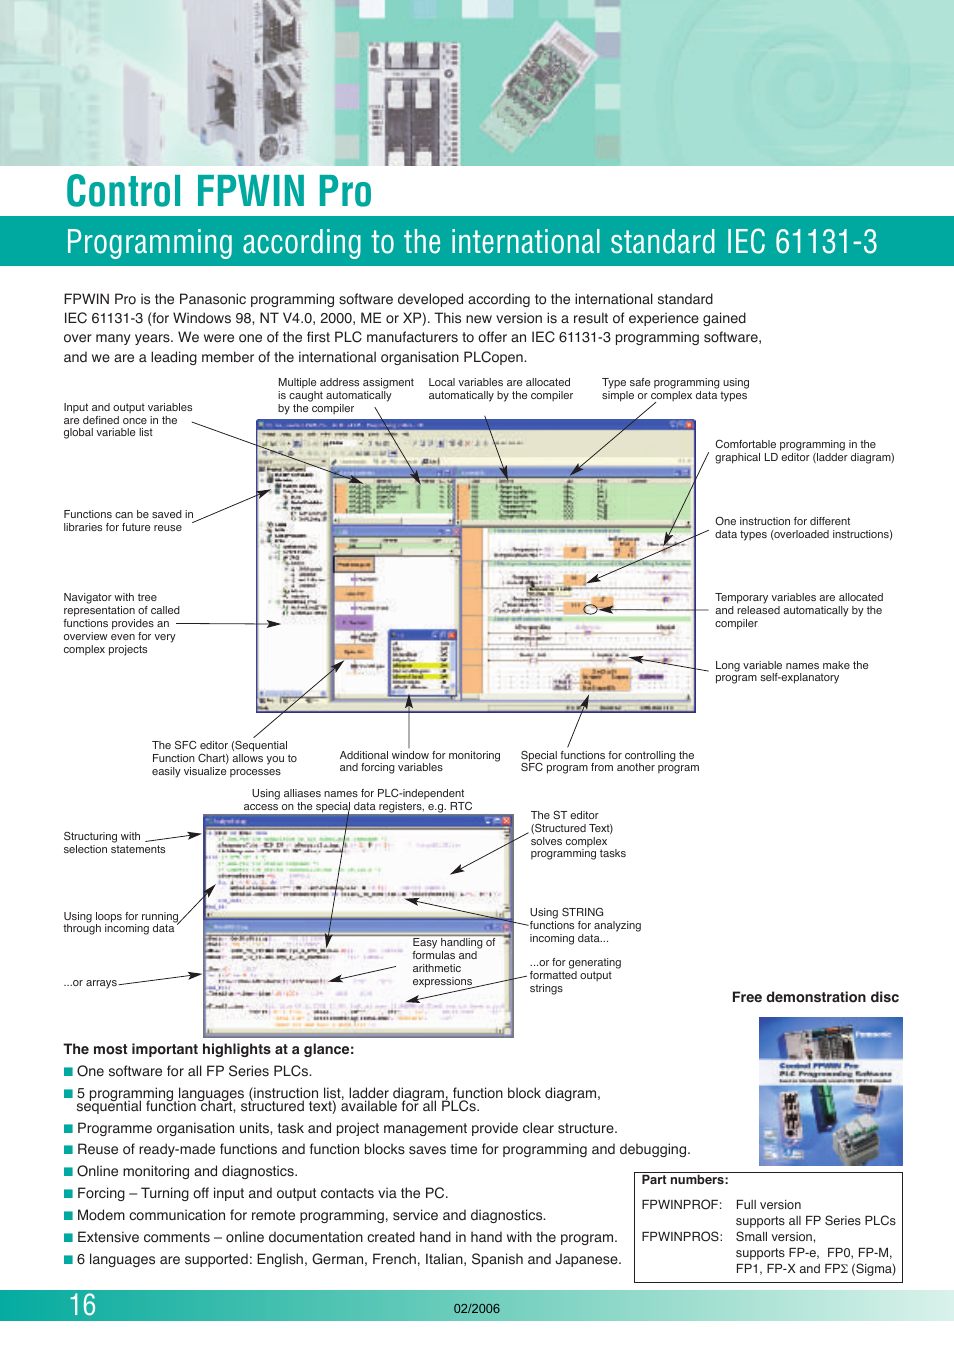 Control fpwin pro | Panasonic FP (Sigma) User Manual | Page 16 / 20